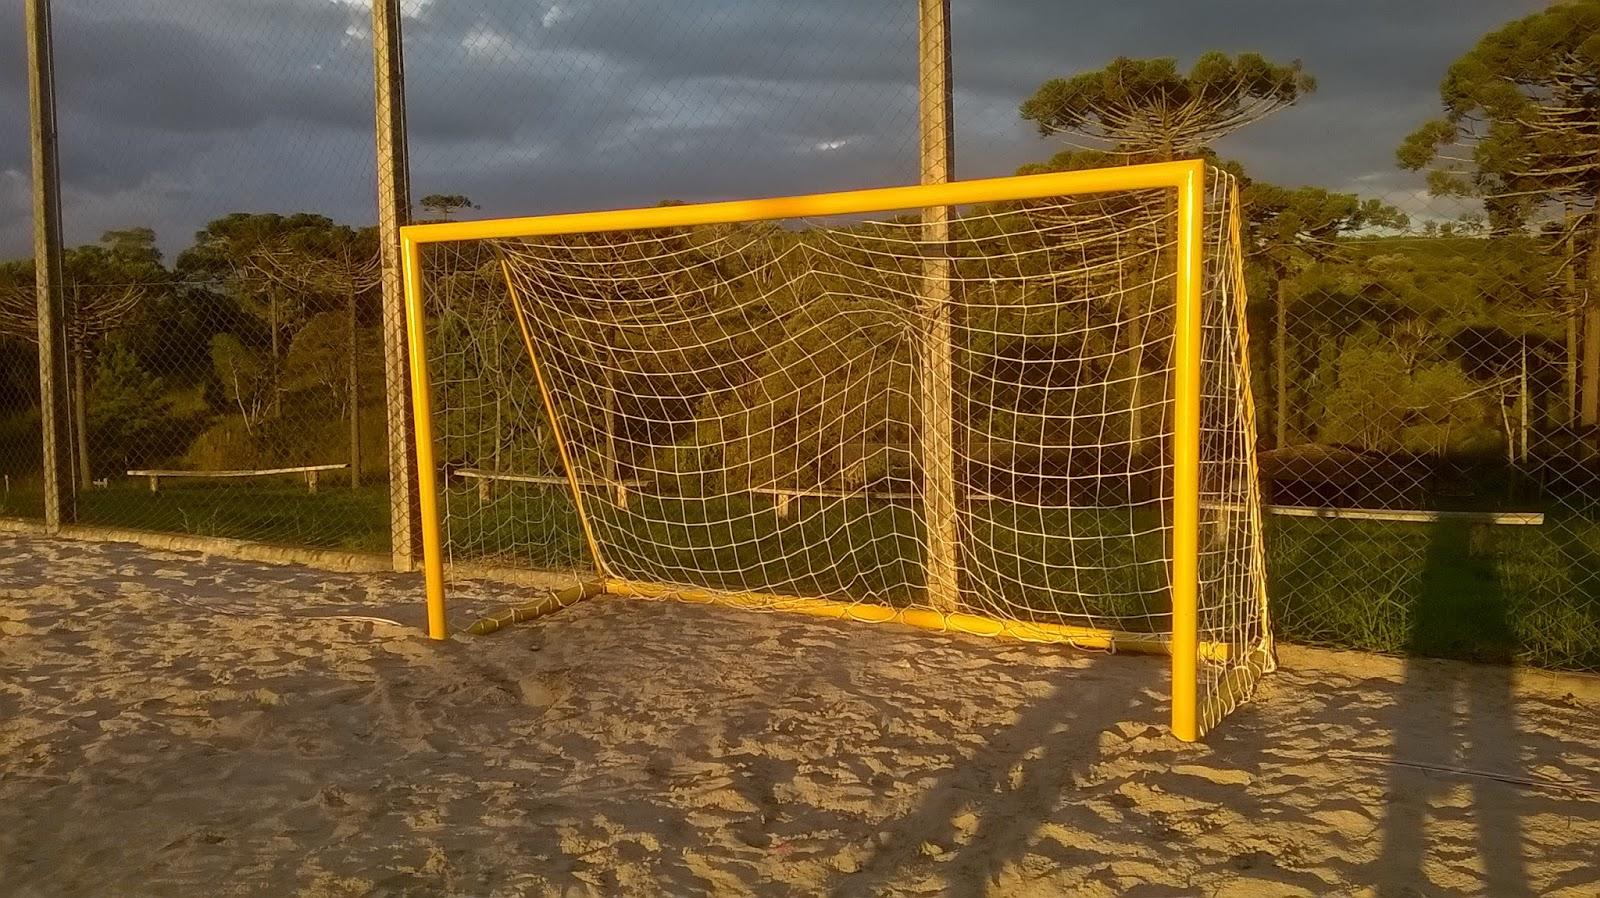 Futebol de Areia 2016 - Jogos do Sesi agora é mata-mata  740ed7eae178c